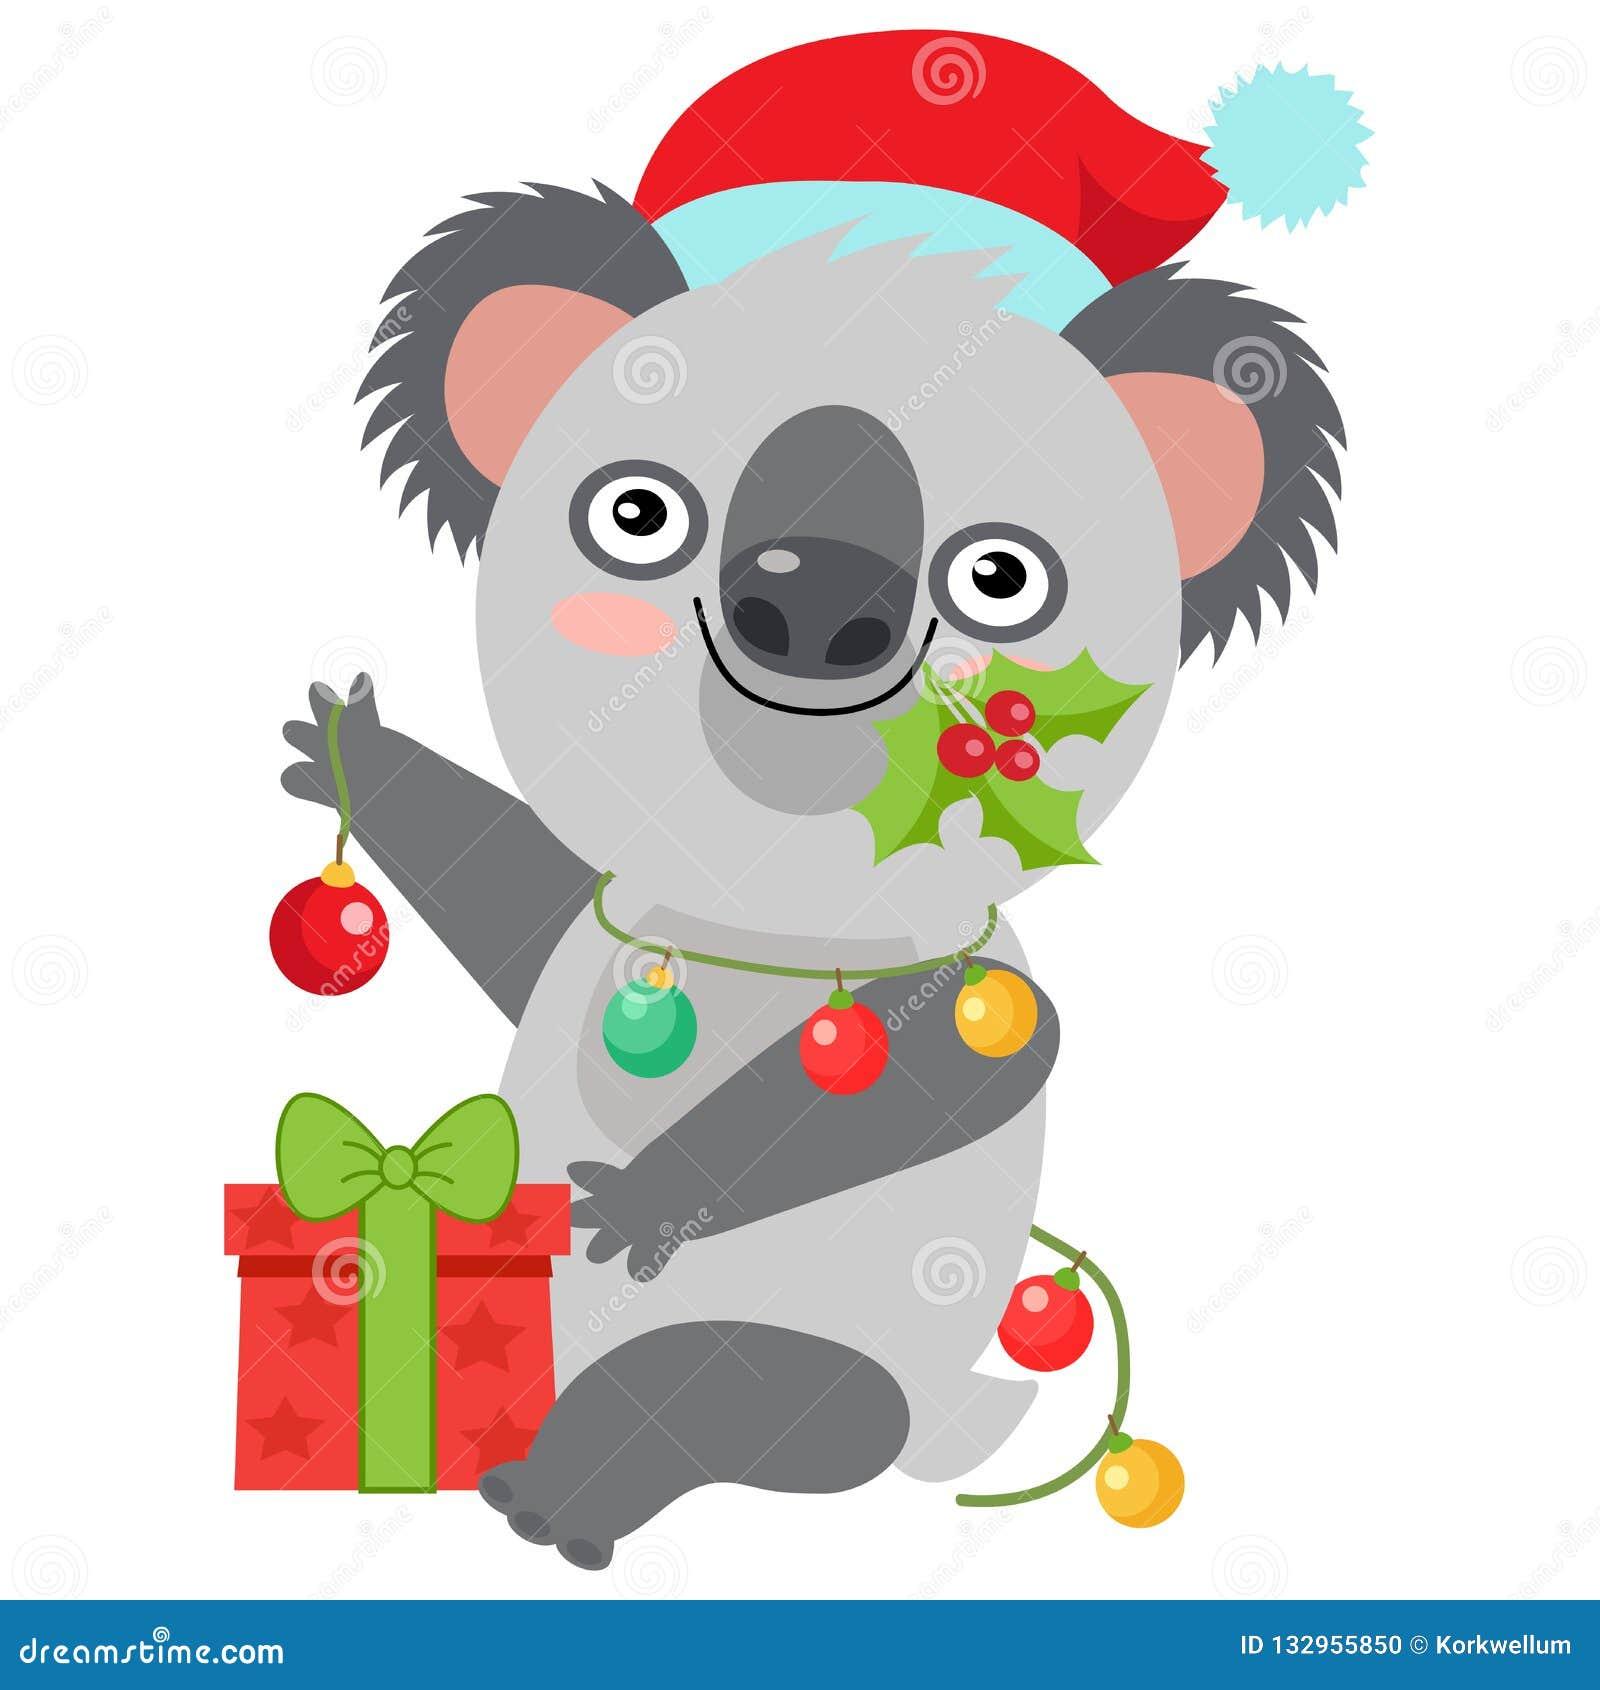 Carte Noel Australie.Vecteur Drole De Noel De Koala Joyeux Noel De Carte De Noel